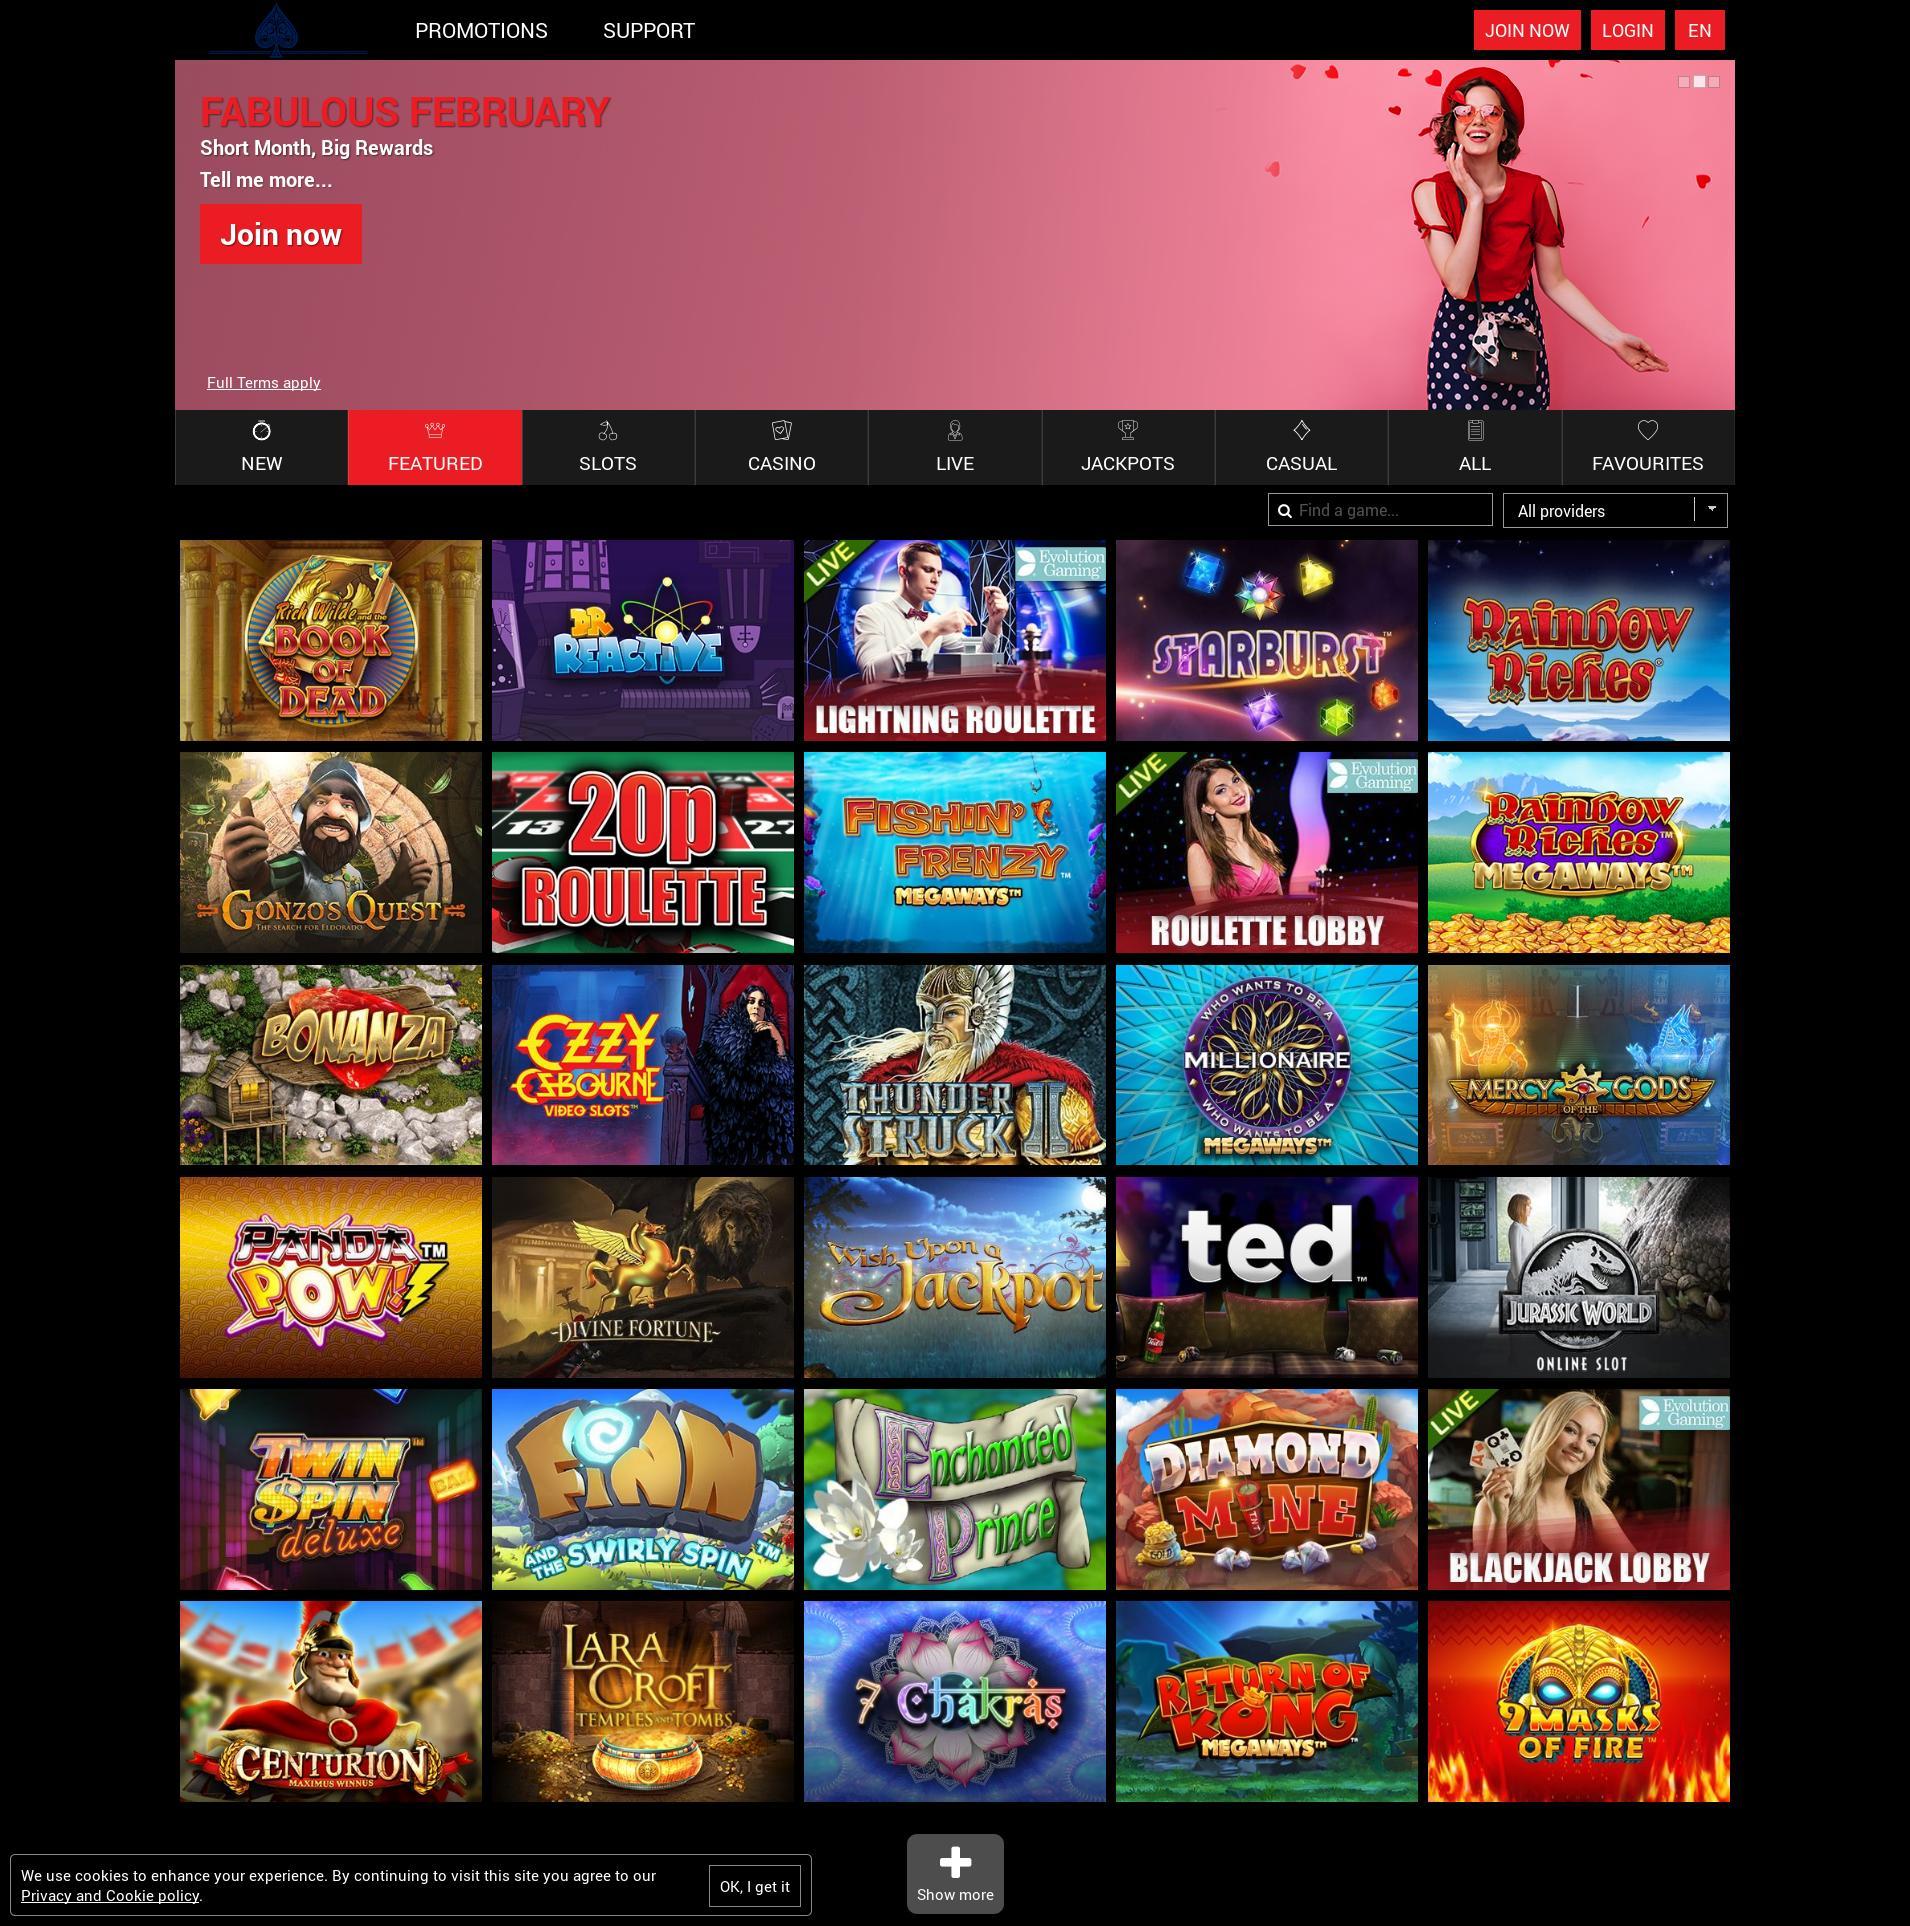 Casino screen Lobby 2020-02-22 for United Kingdom